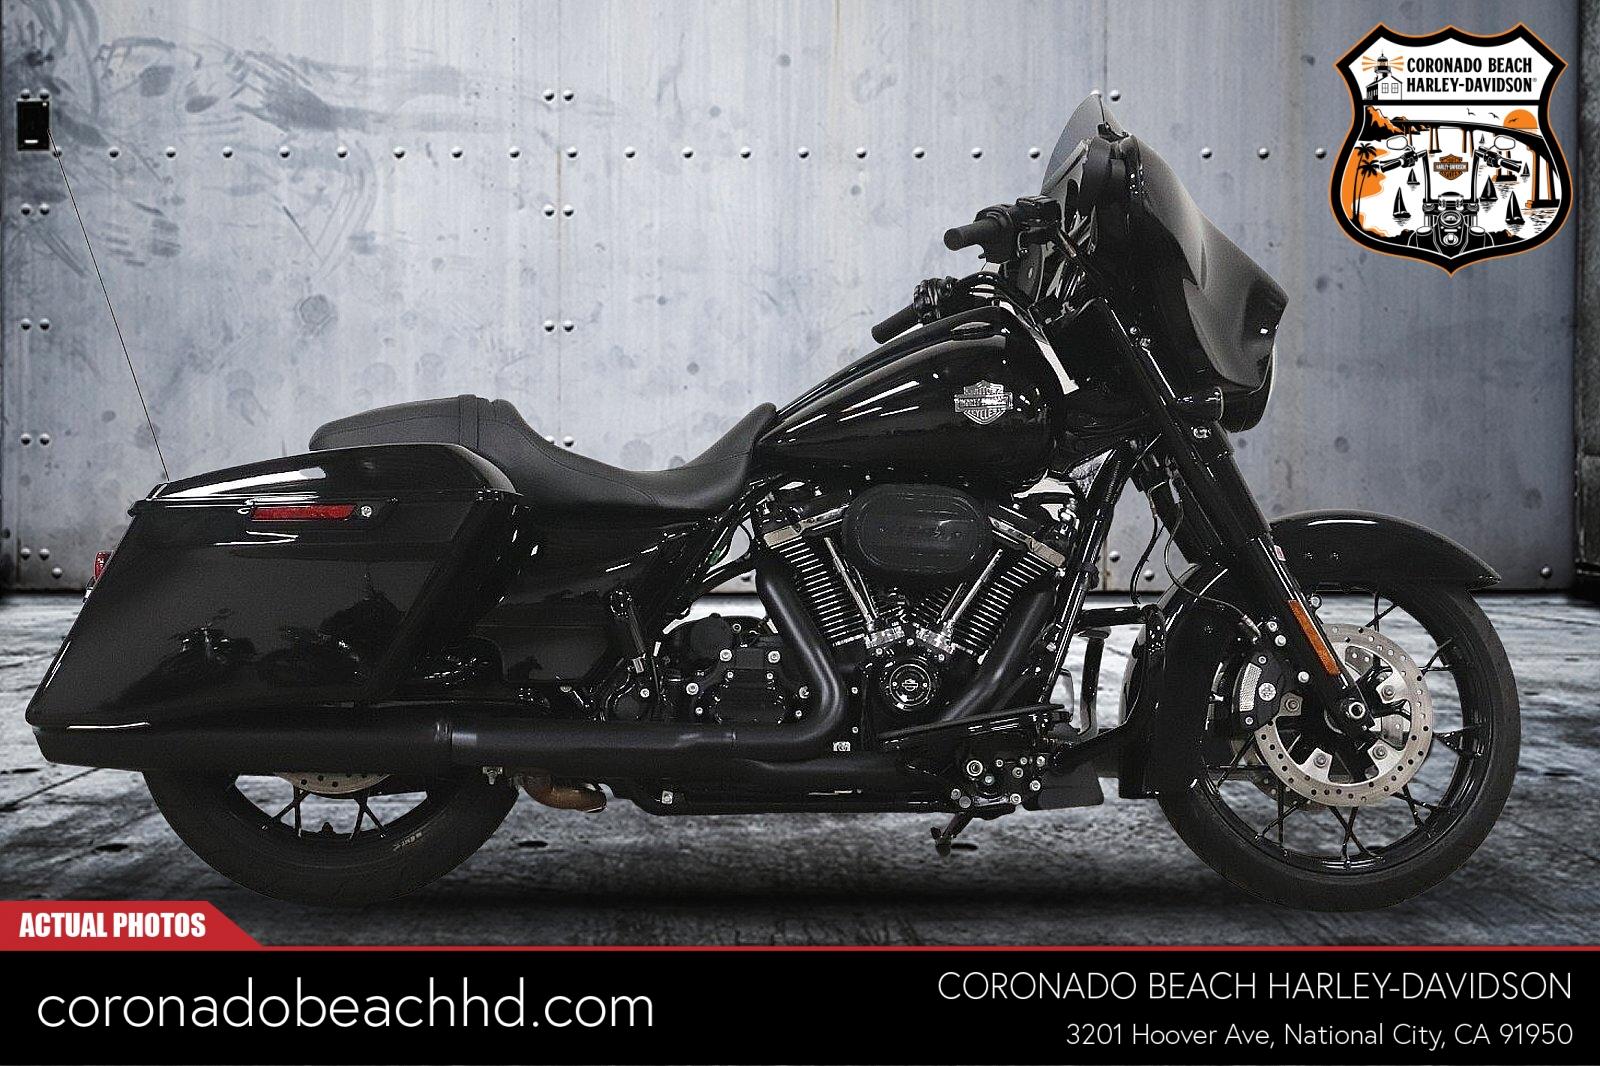 2021 Harley-Davidson Street Glide Special [41]